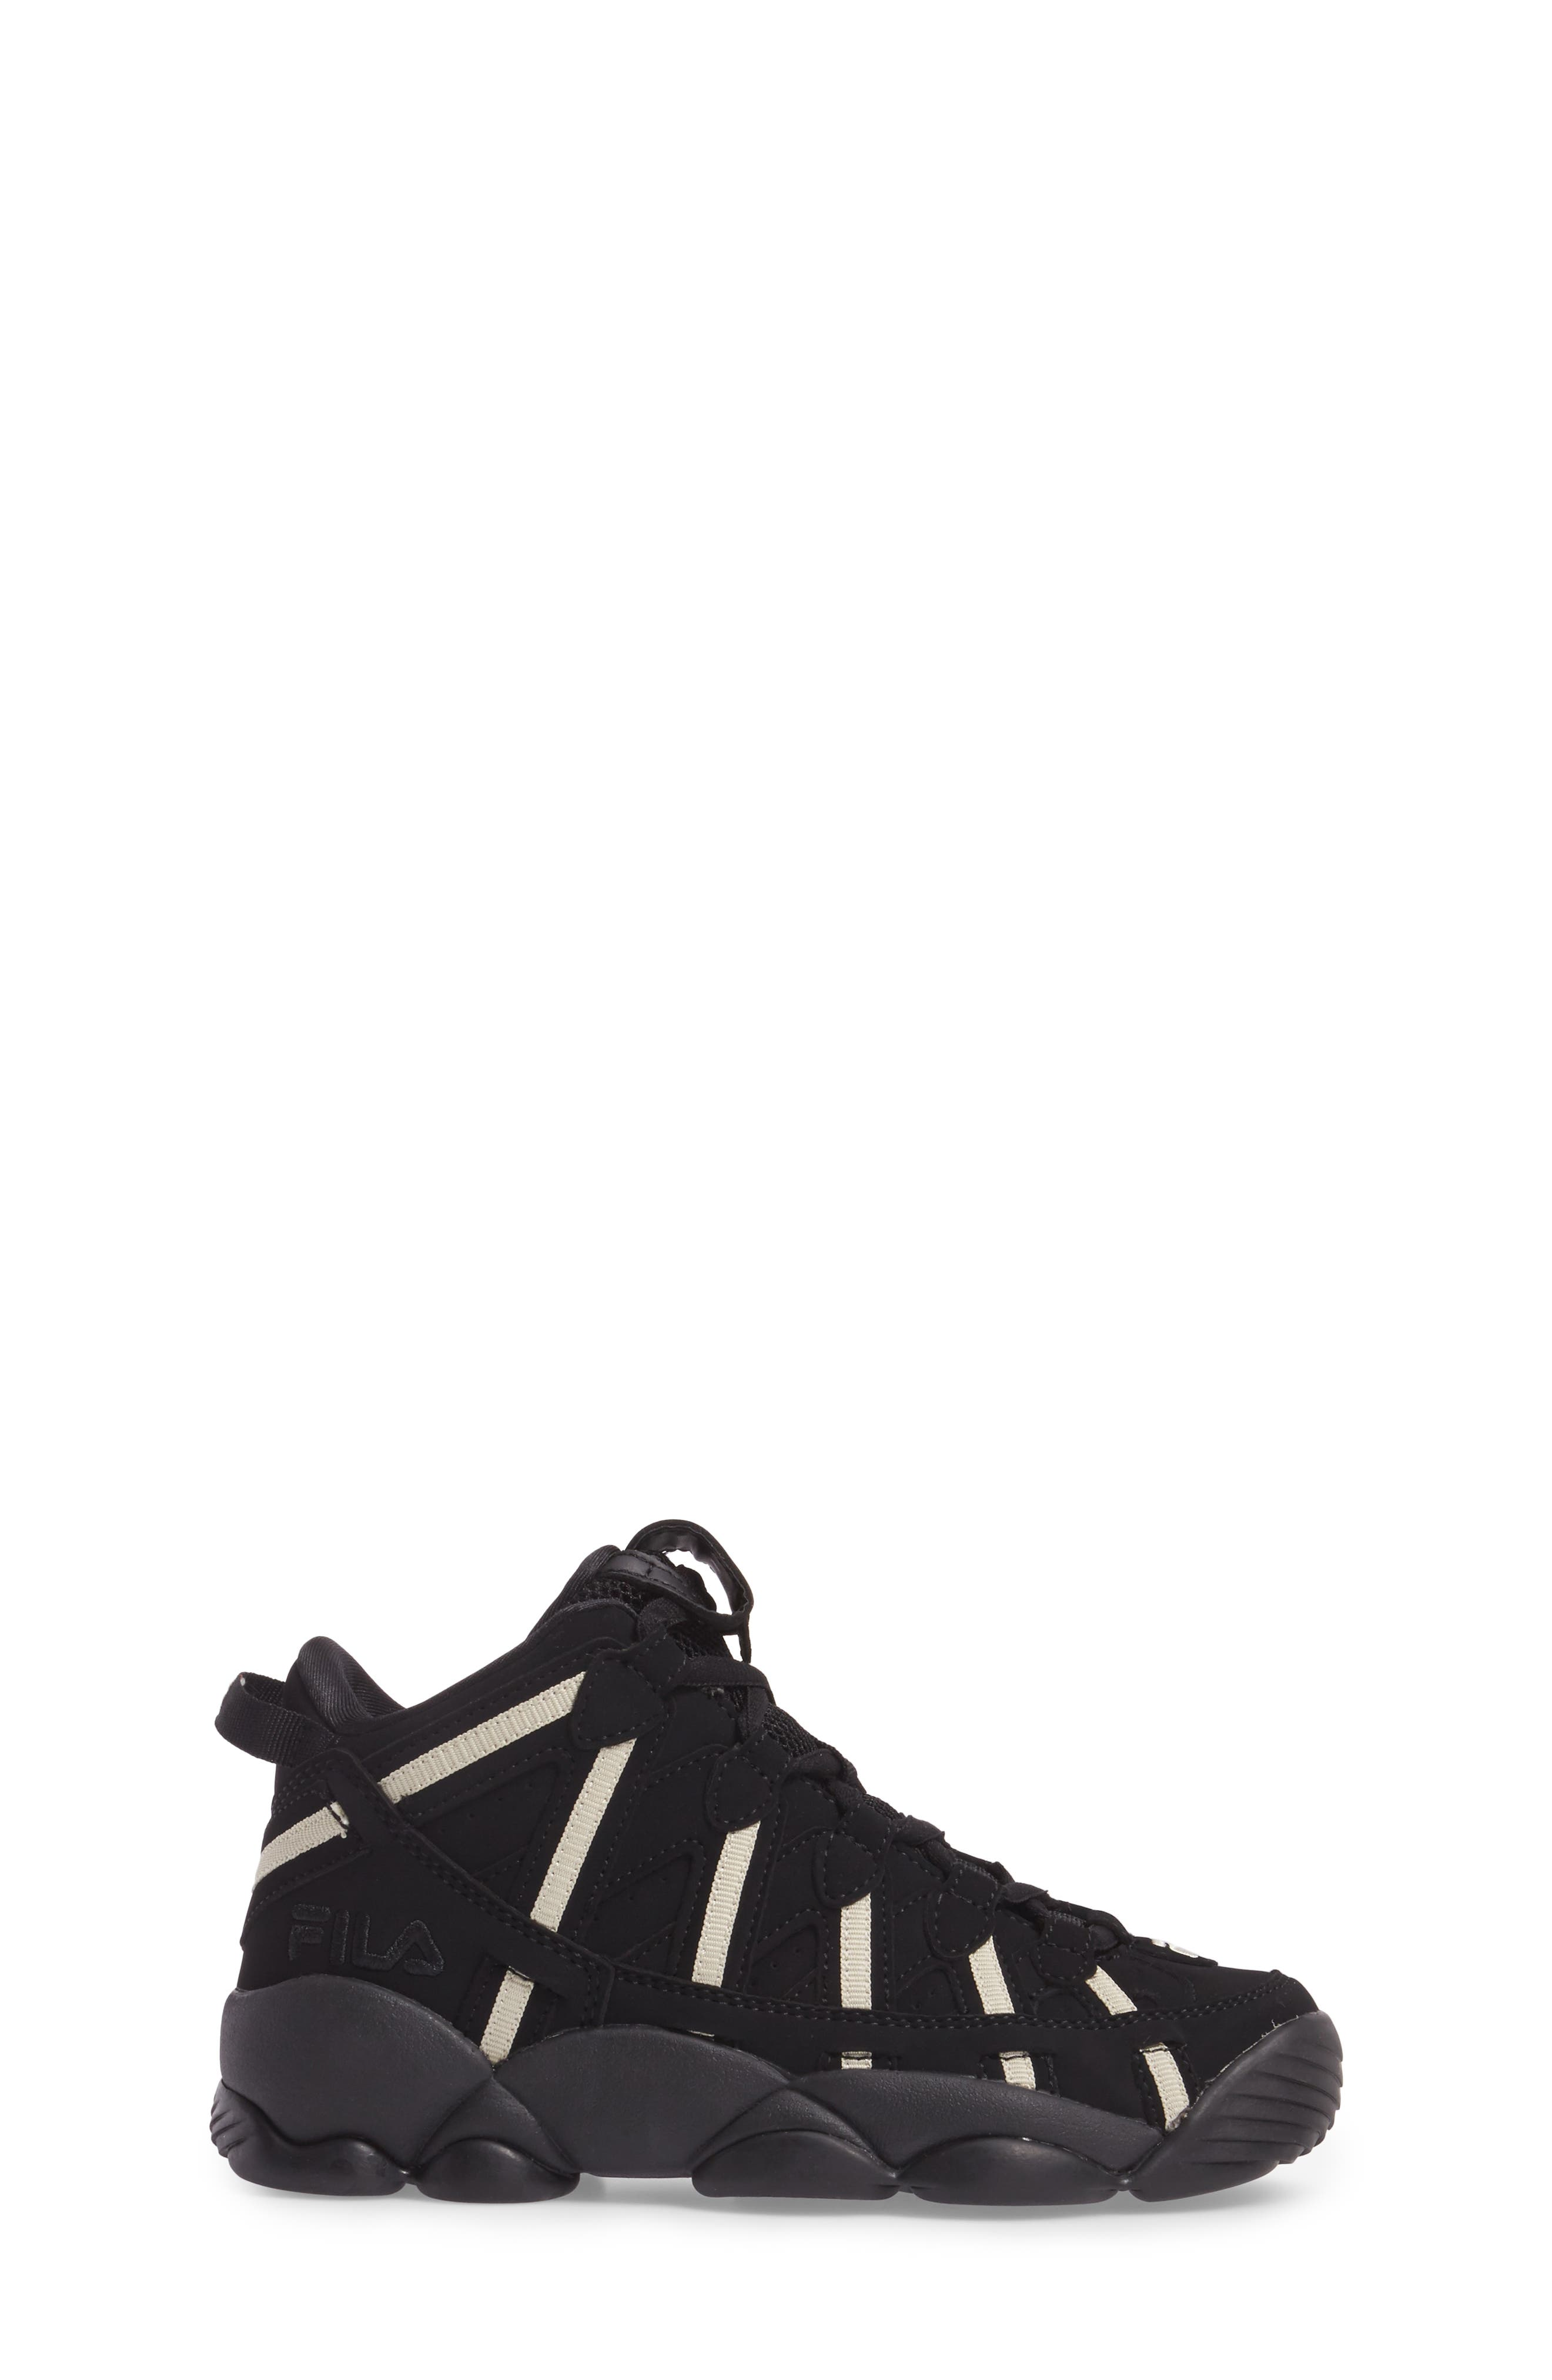 Spaghetti Deluxe Mid Top Sneaker,                             Alternate thumbnail 3, color,                             Black/ Cream